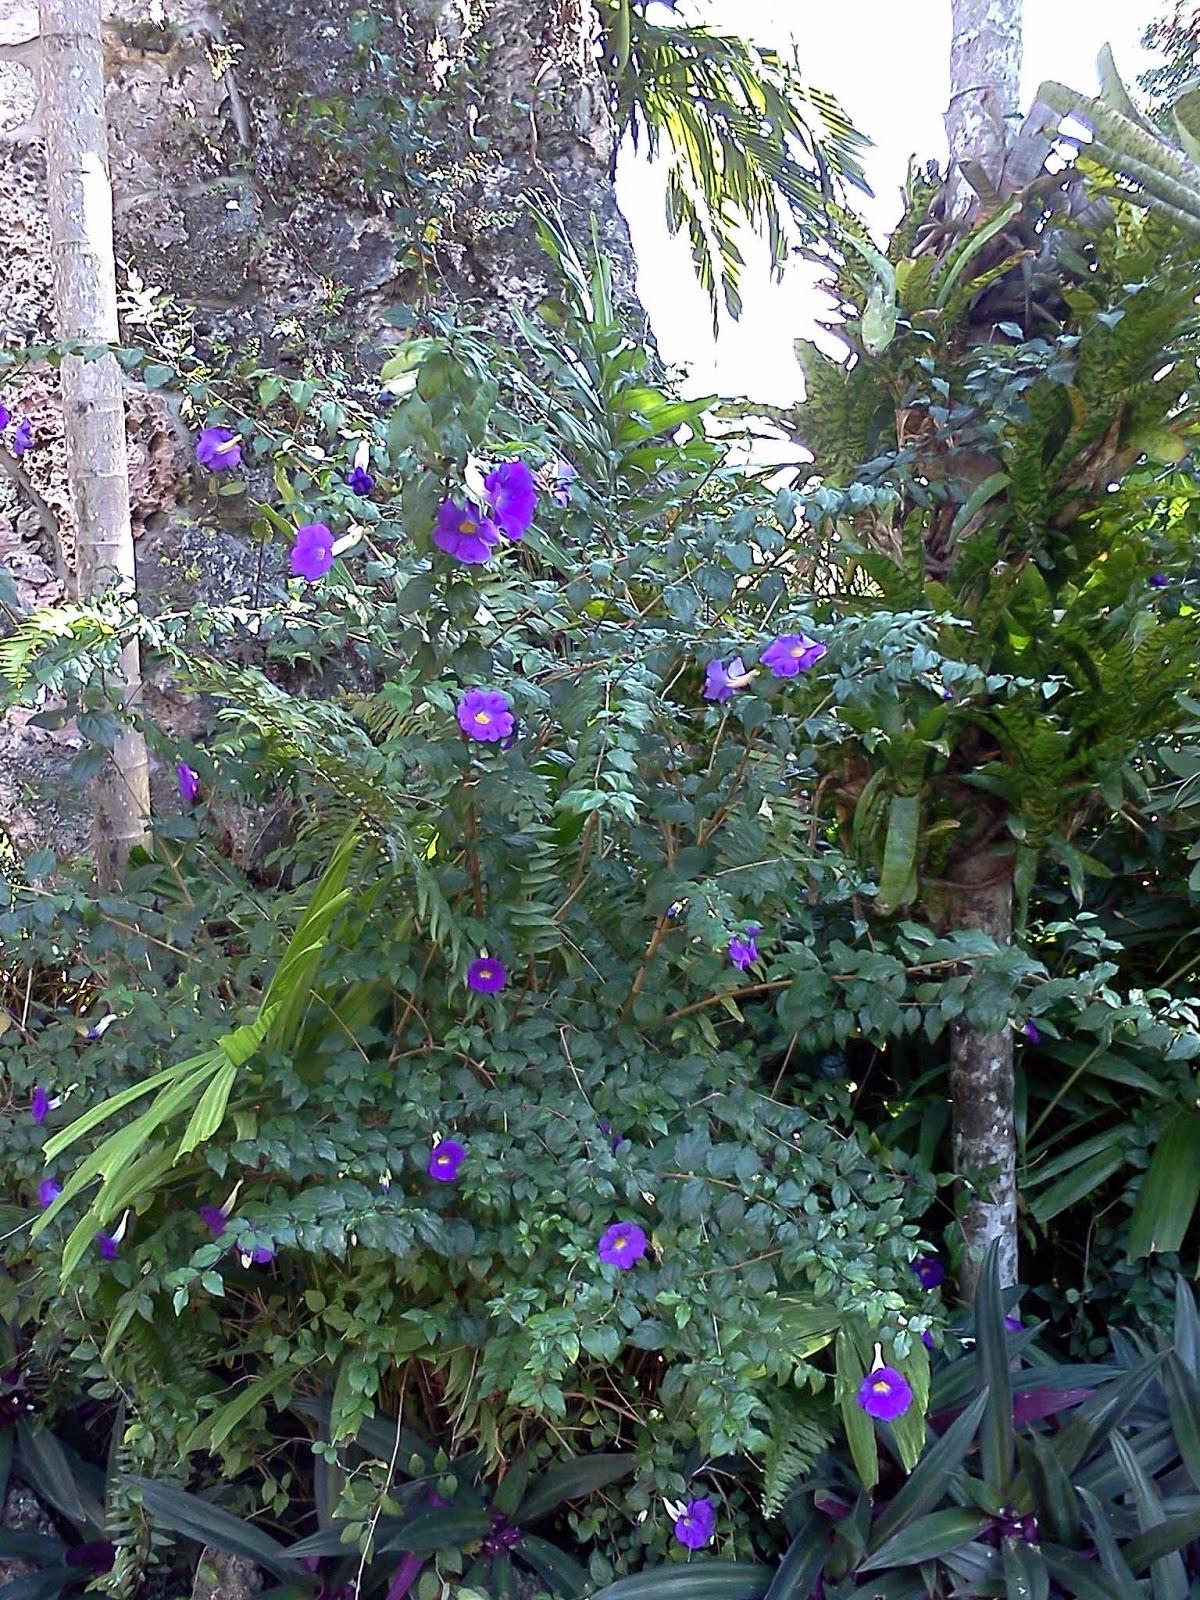 Gardening South Florida Style: South Florida Hedge Plants v.I